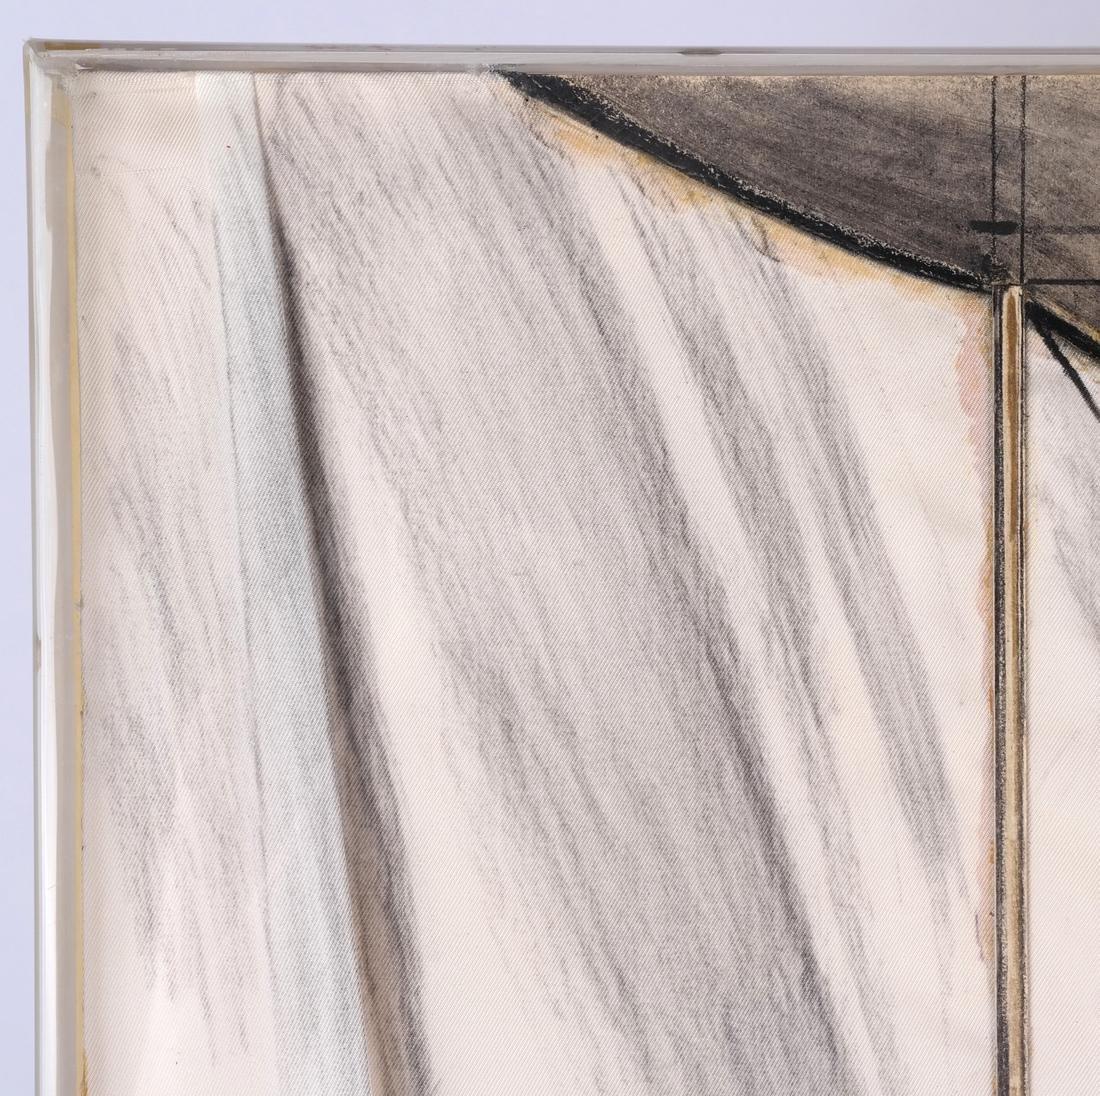 Christo, Running Fence - 9